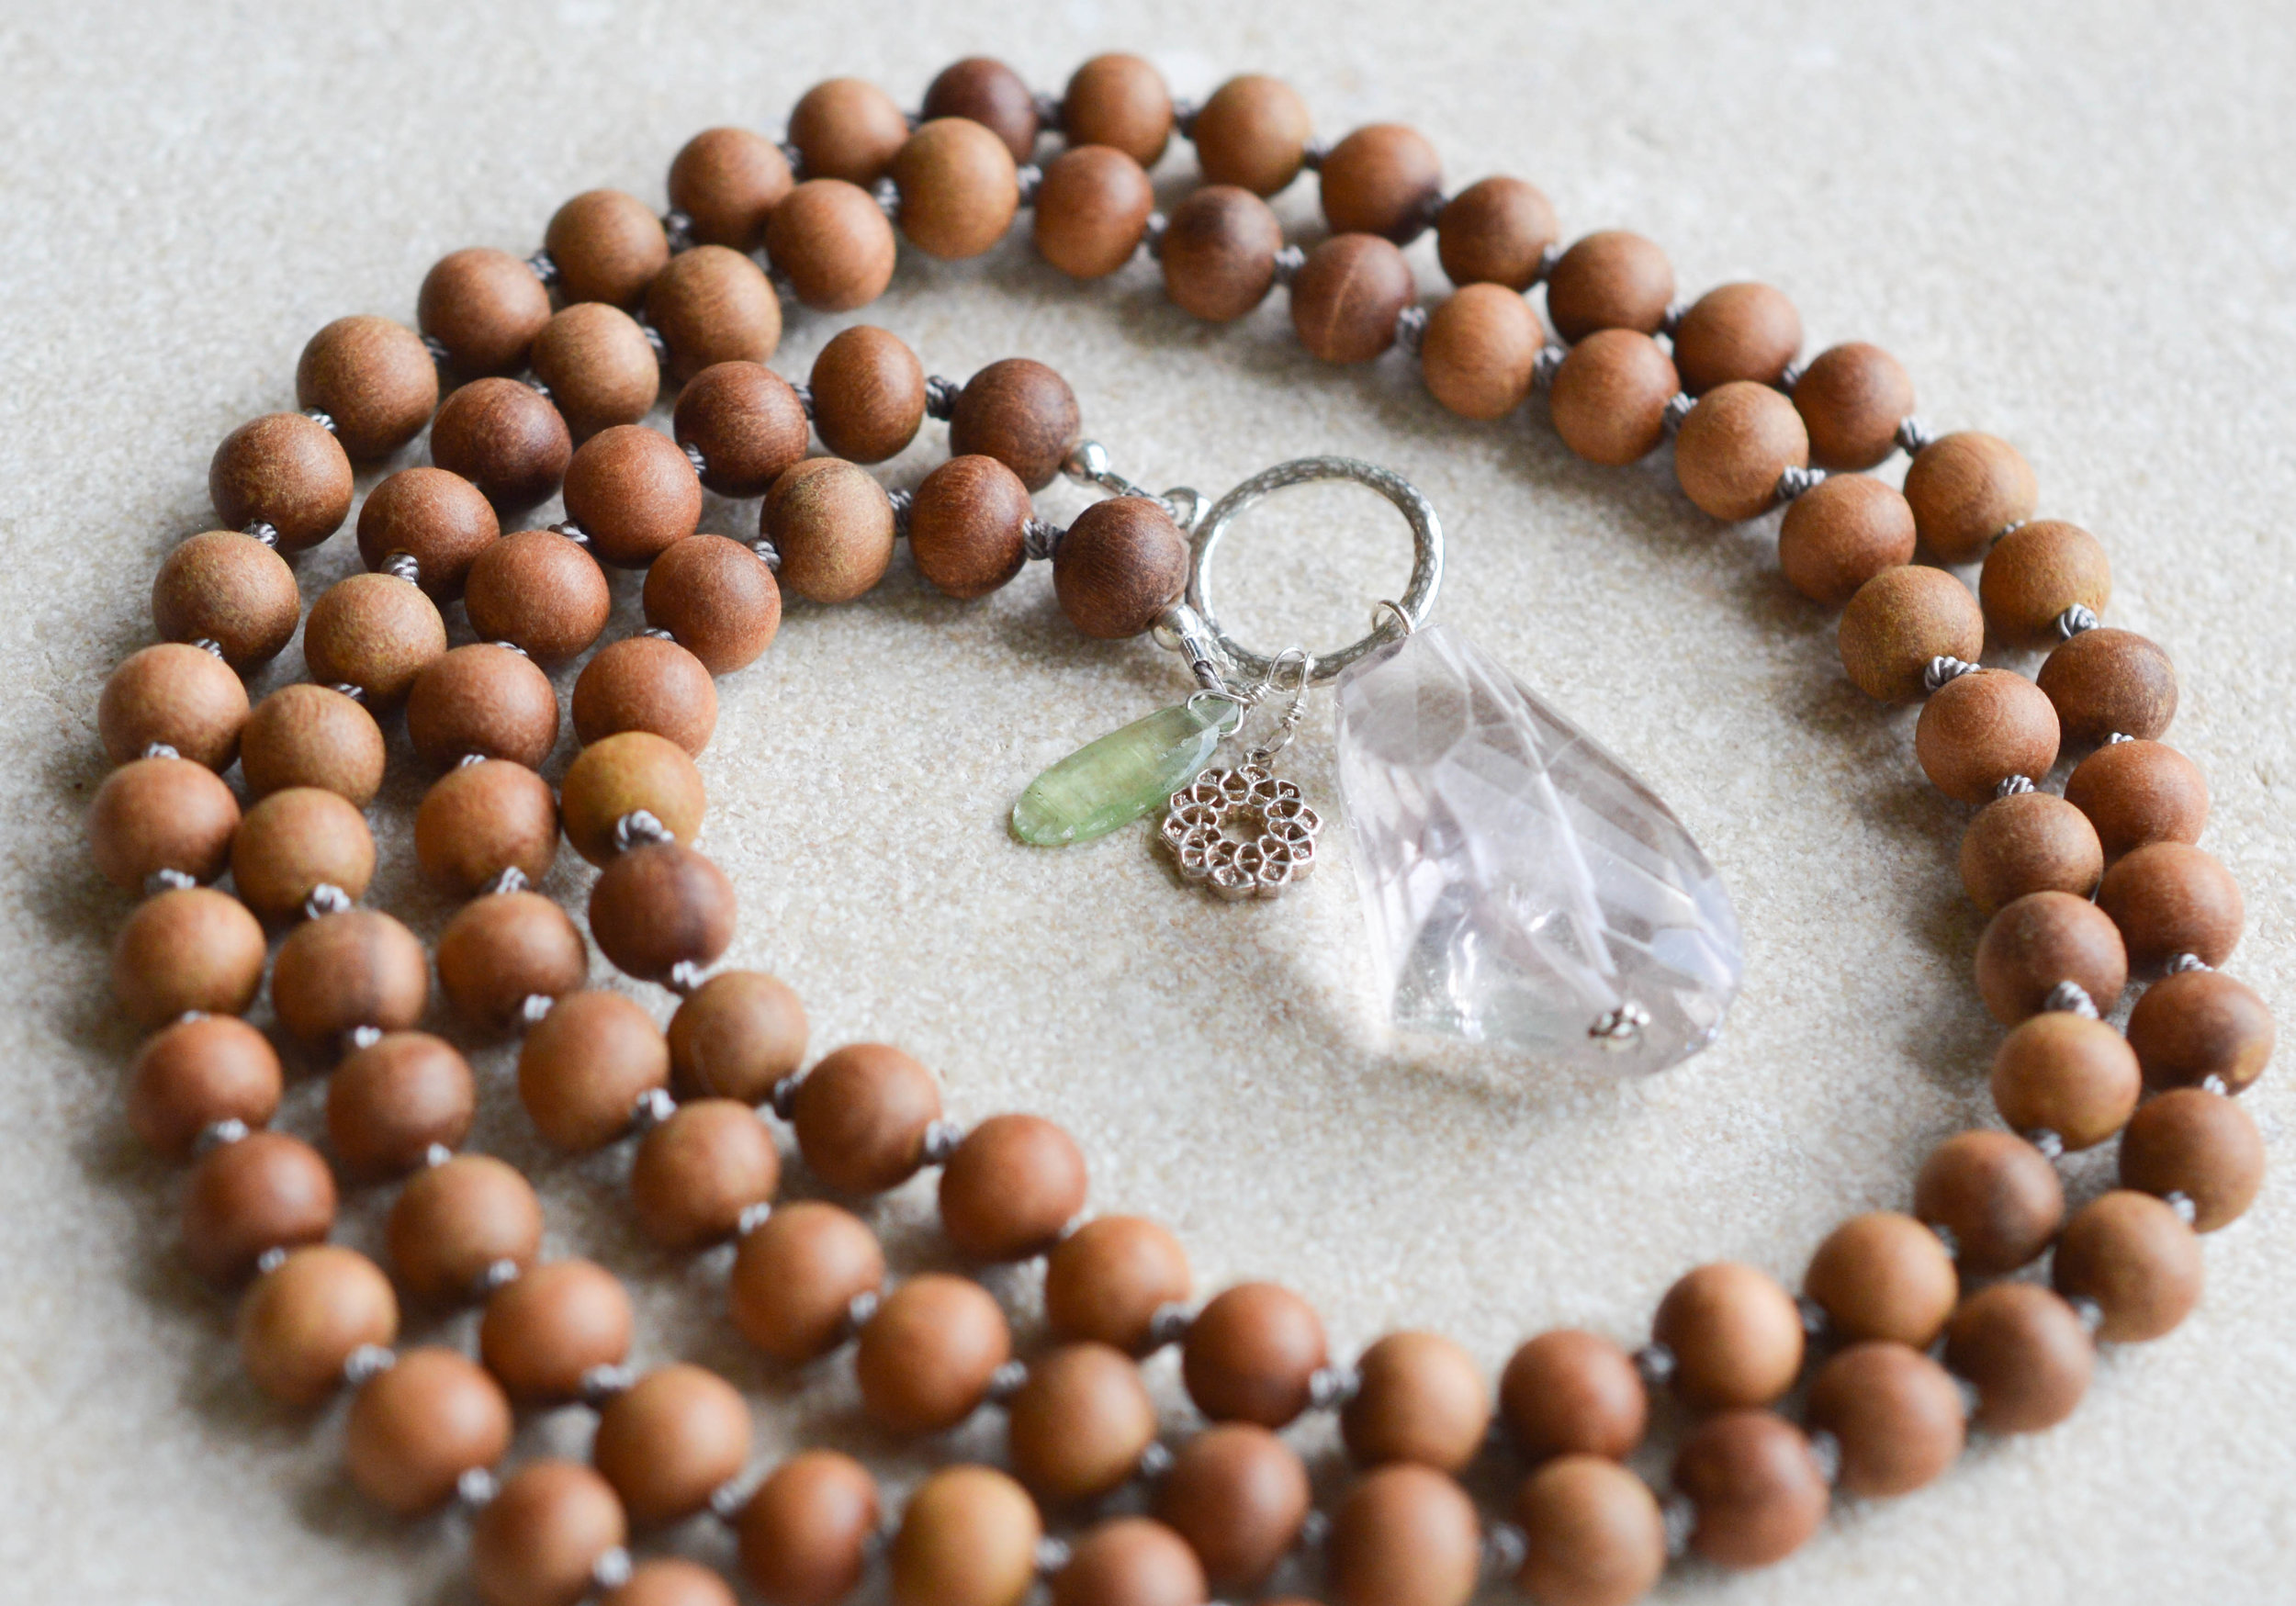 sandalwood-serenity-beads-gemstone-mala-the-jewelry-project-elizabeth-irvine-truewellbeing-21.jpg